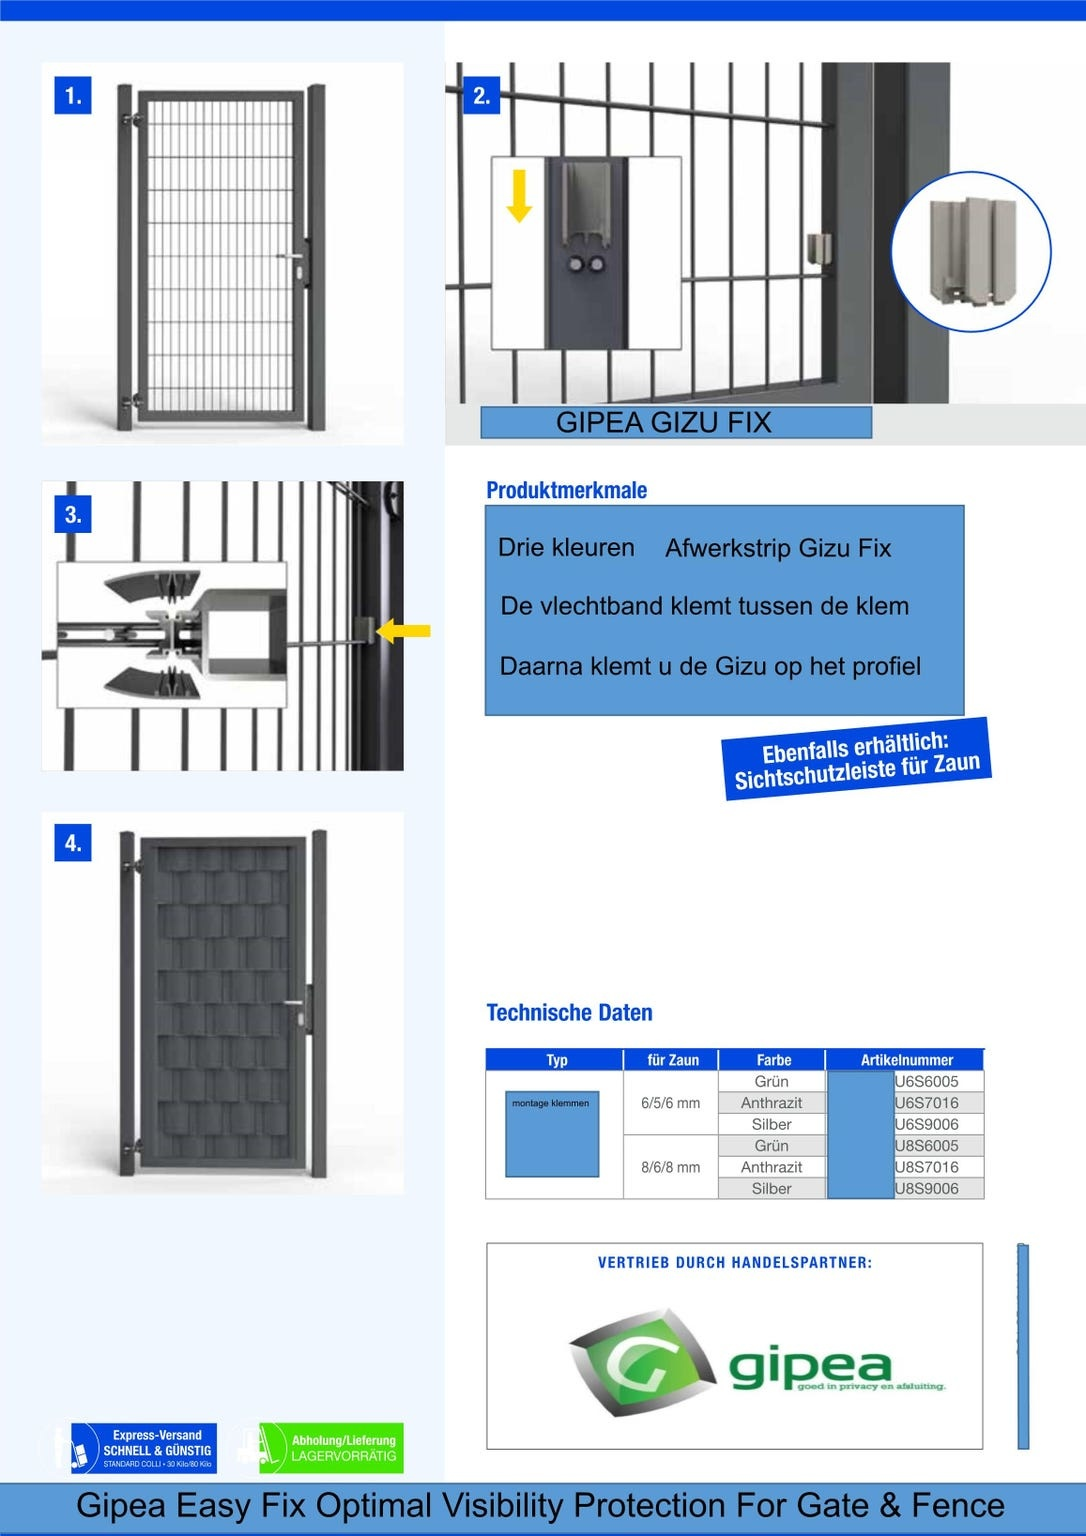 Gipea Easy To Fix Optimal Visibility Protection For Gate & Fence 9  banen ekoband van 85 cm tot 105 cm + Master Fix Afwerk Profielen  180 cm